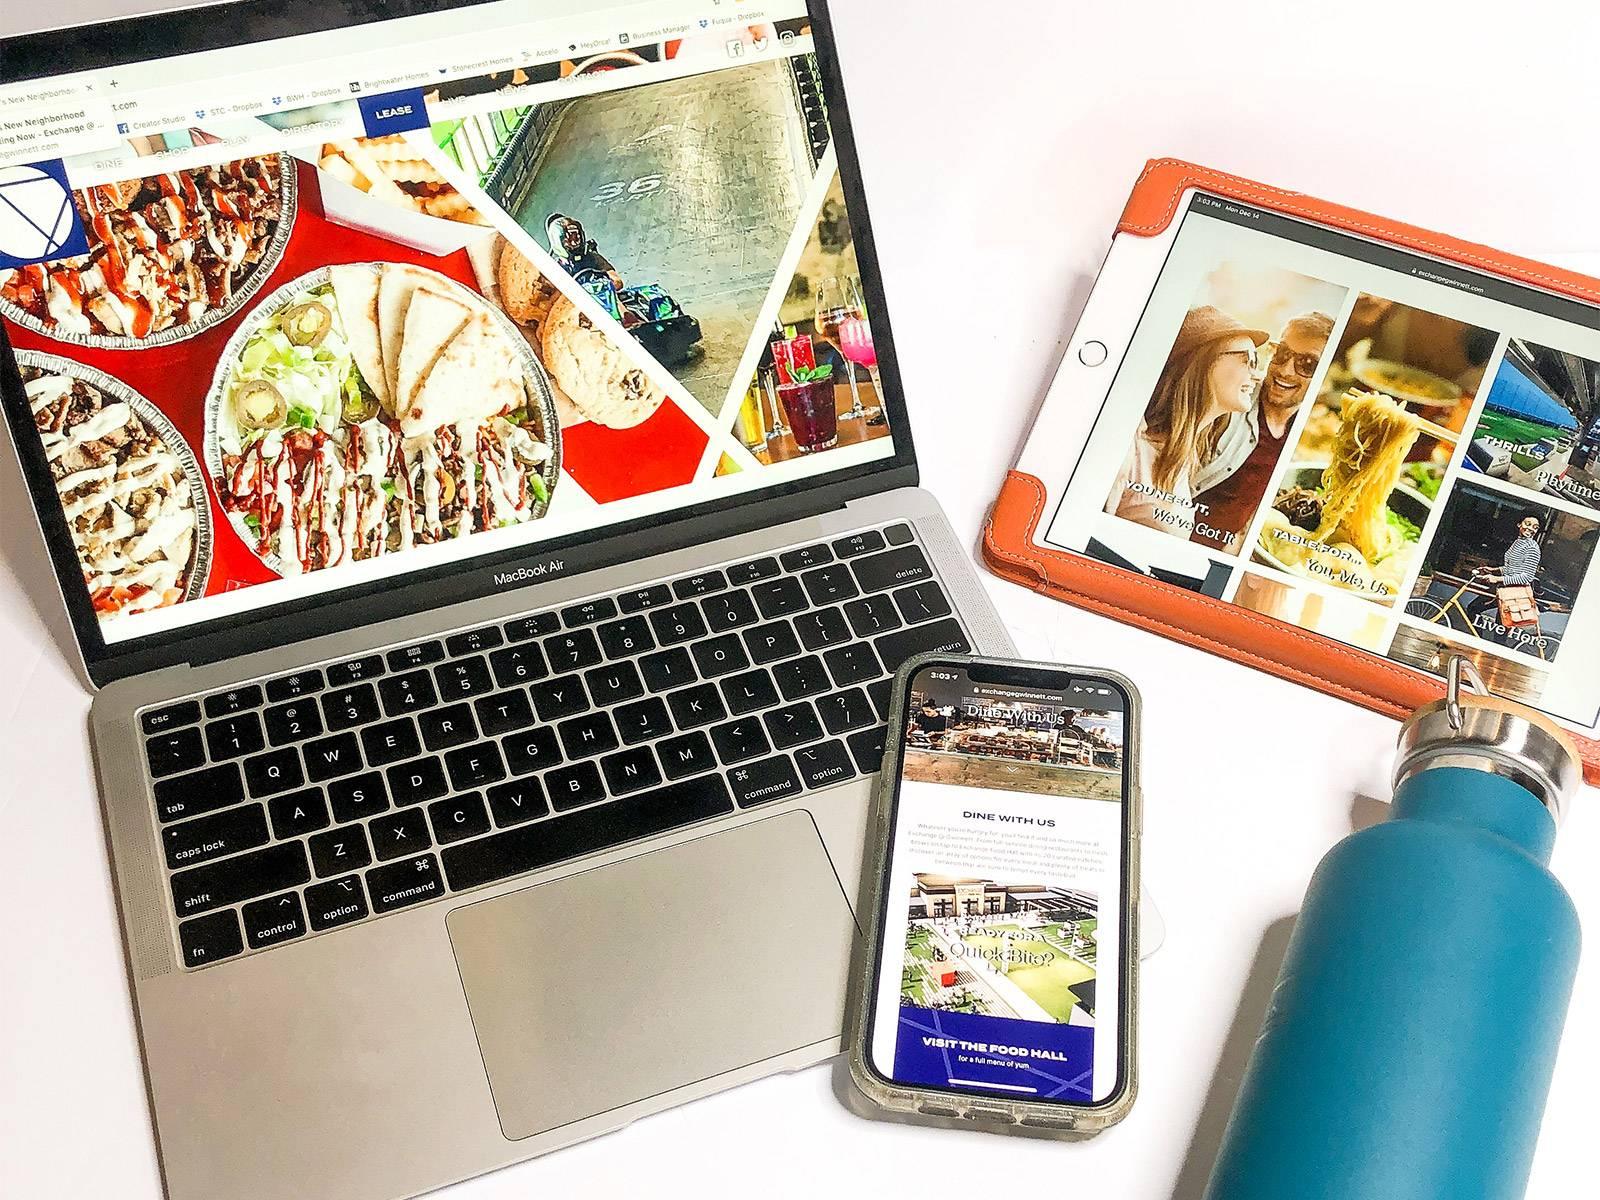 The Exchange at Gwinnett   Custom Website Design and Development by Clementine Creative Agency   Atlanta, GA